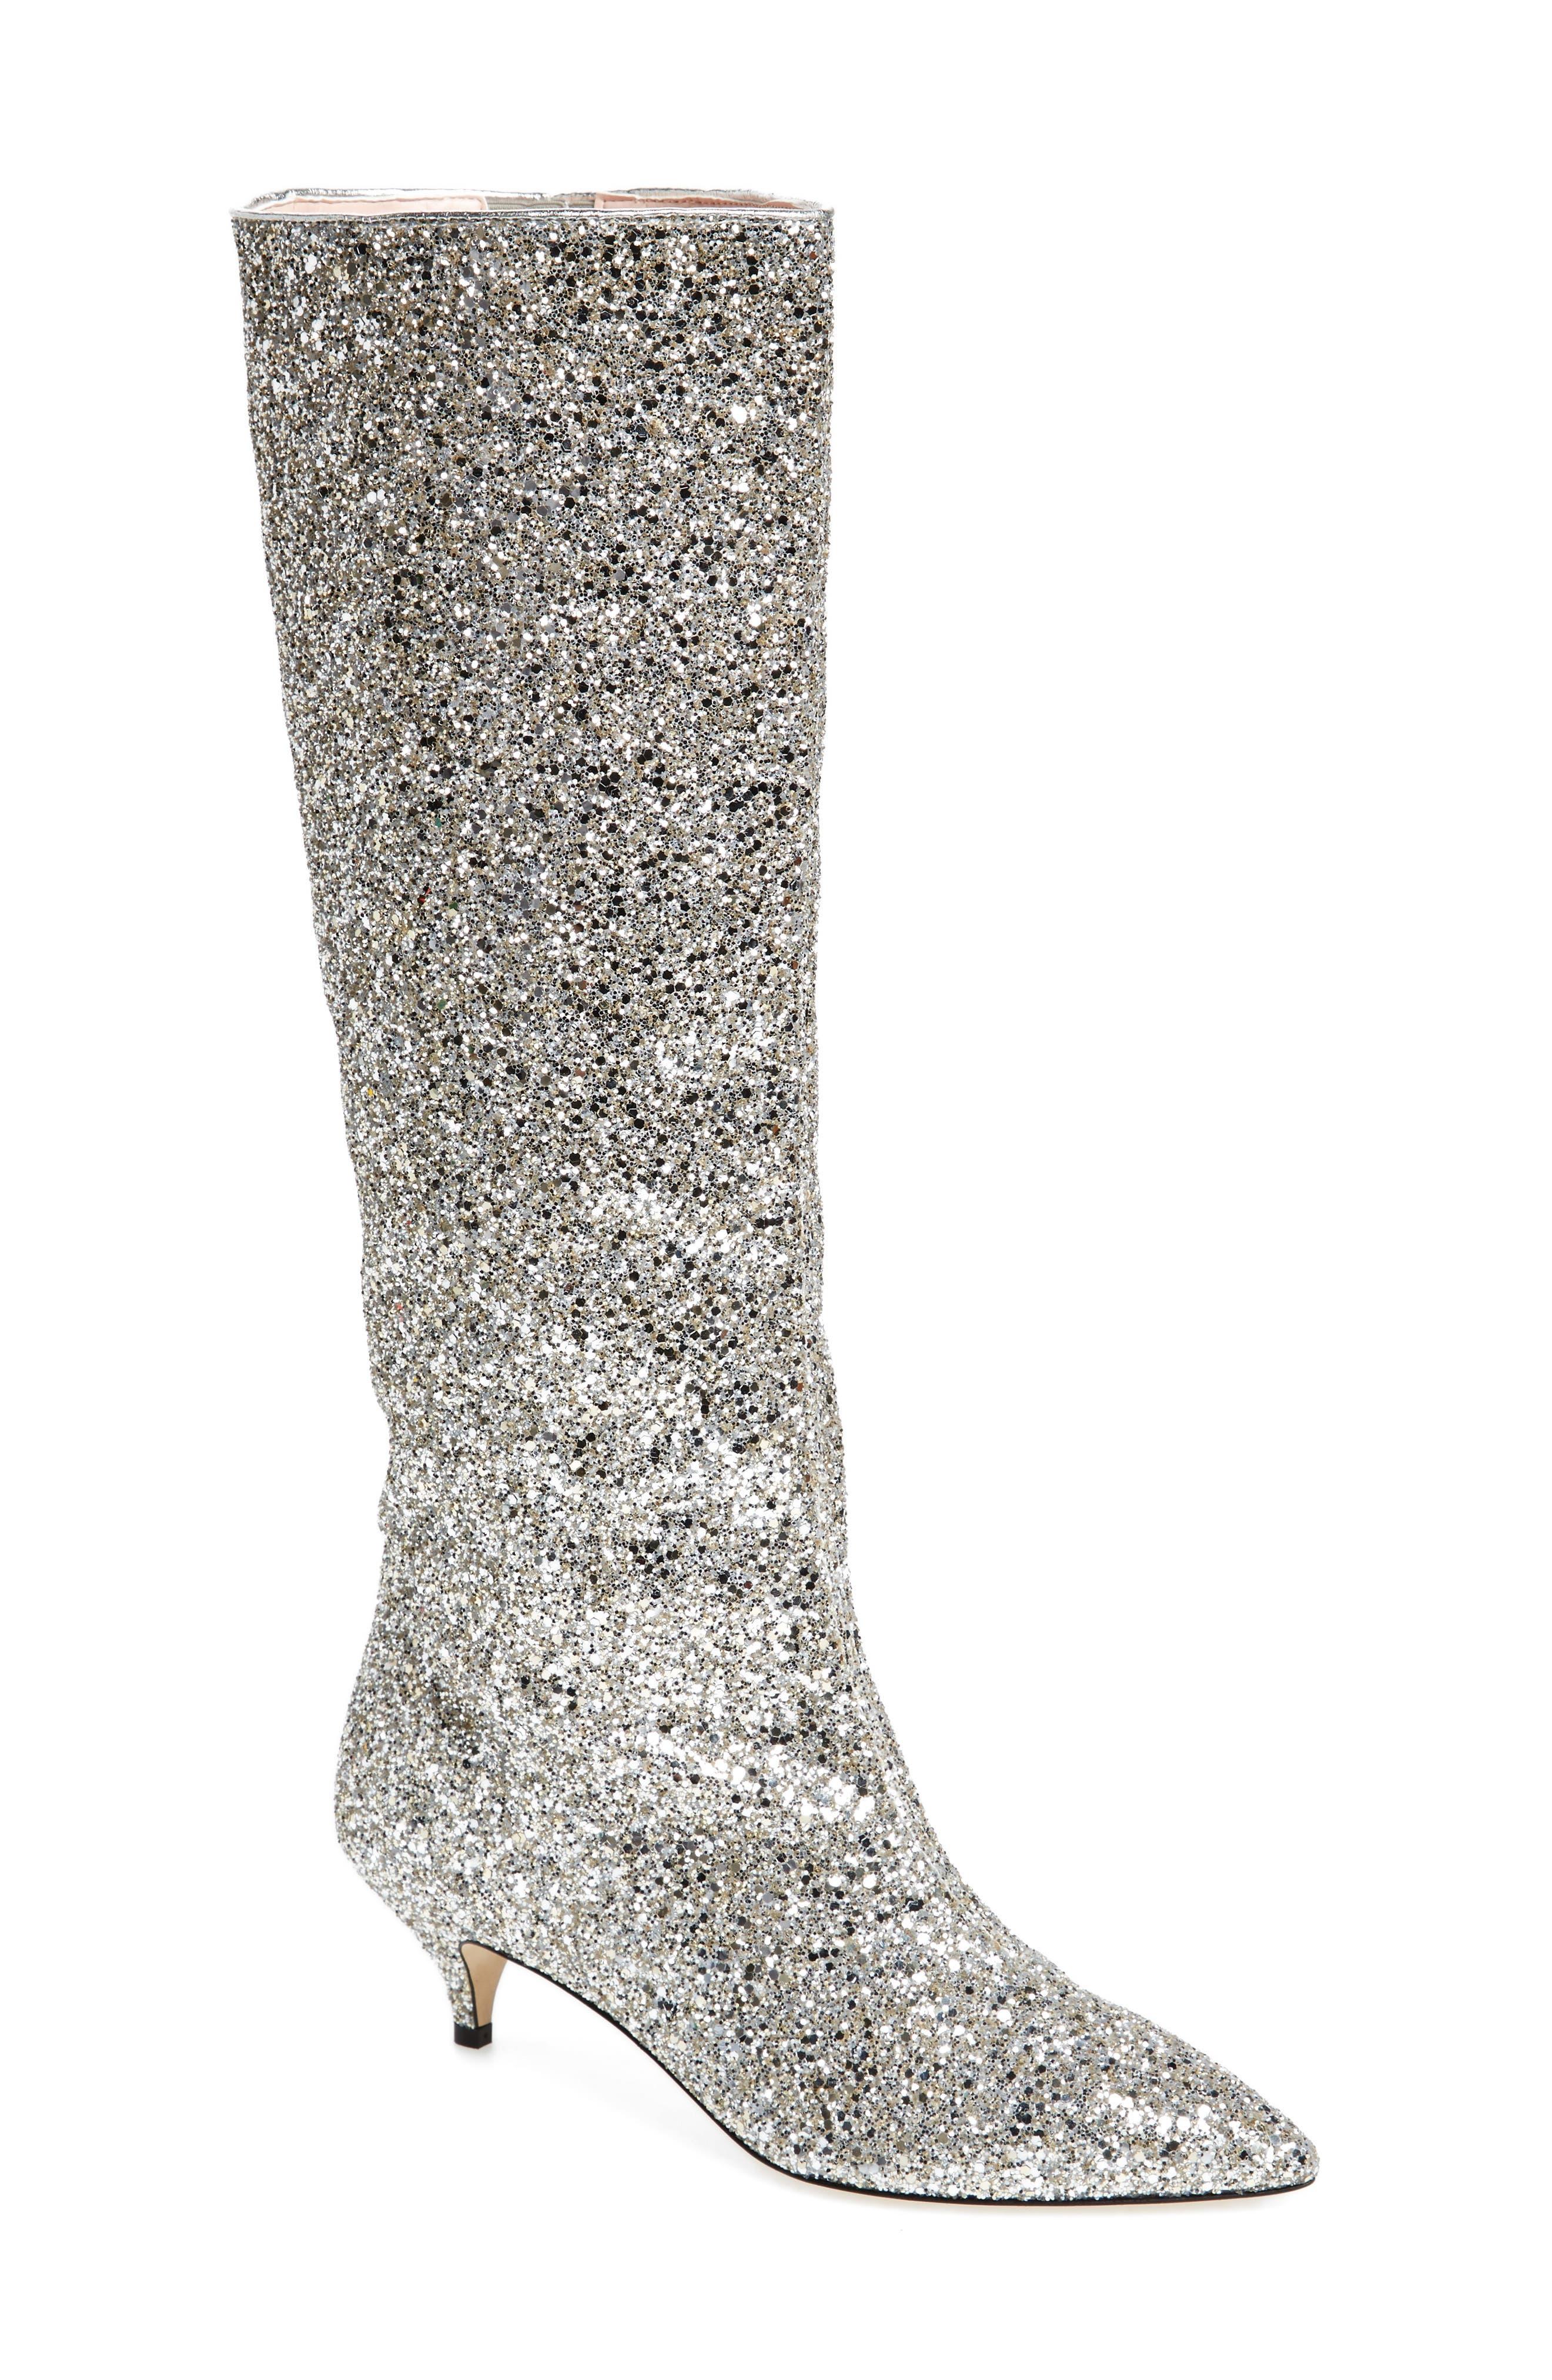 olina glitter knee high boot,                         Main,                         color, 710